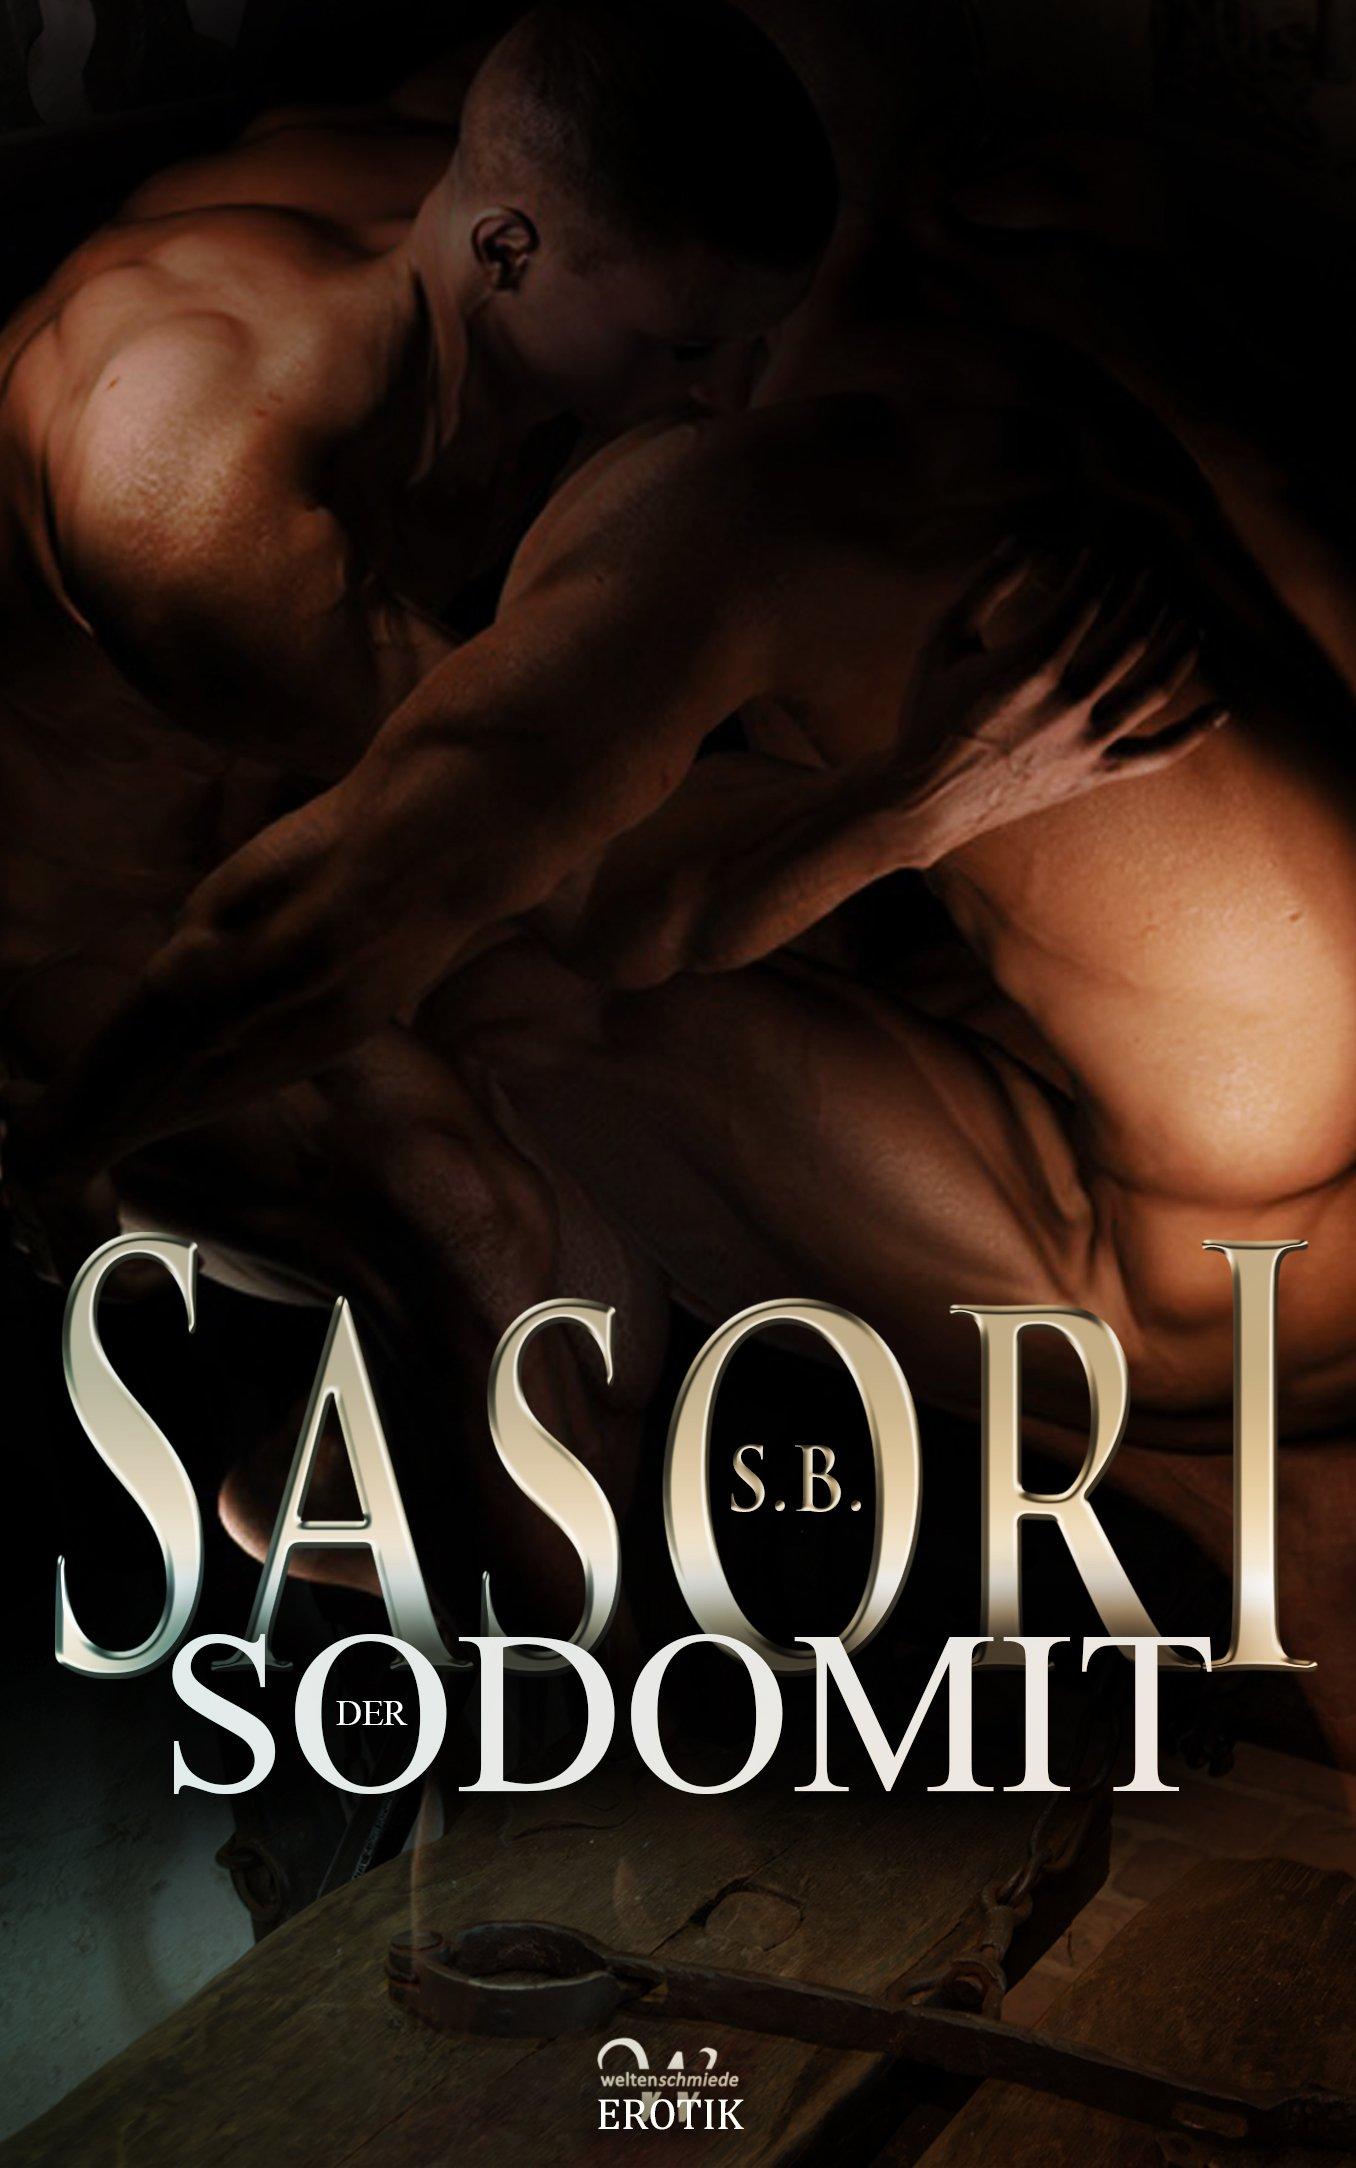 http://www.amazon.de/Der-Sodomit-S-B-Sasori/dp/3944504135/ref=tmm_pap_title_0?ie=UTF8&qid=1417620148&sr=8-1